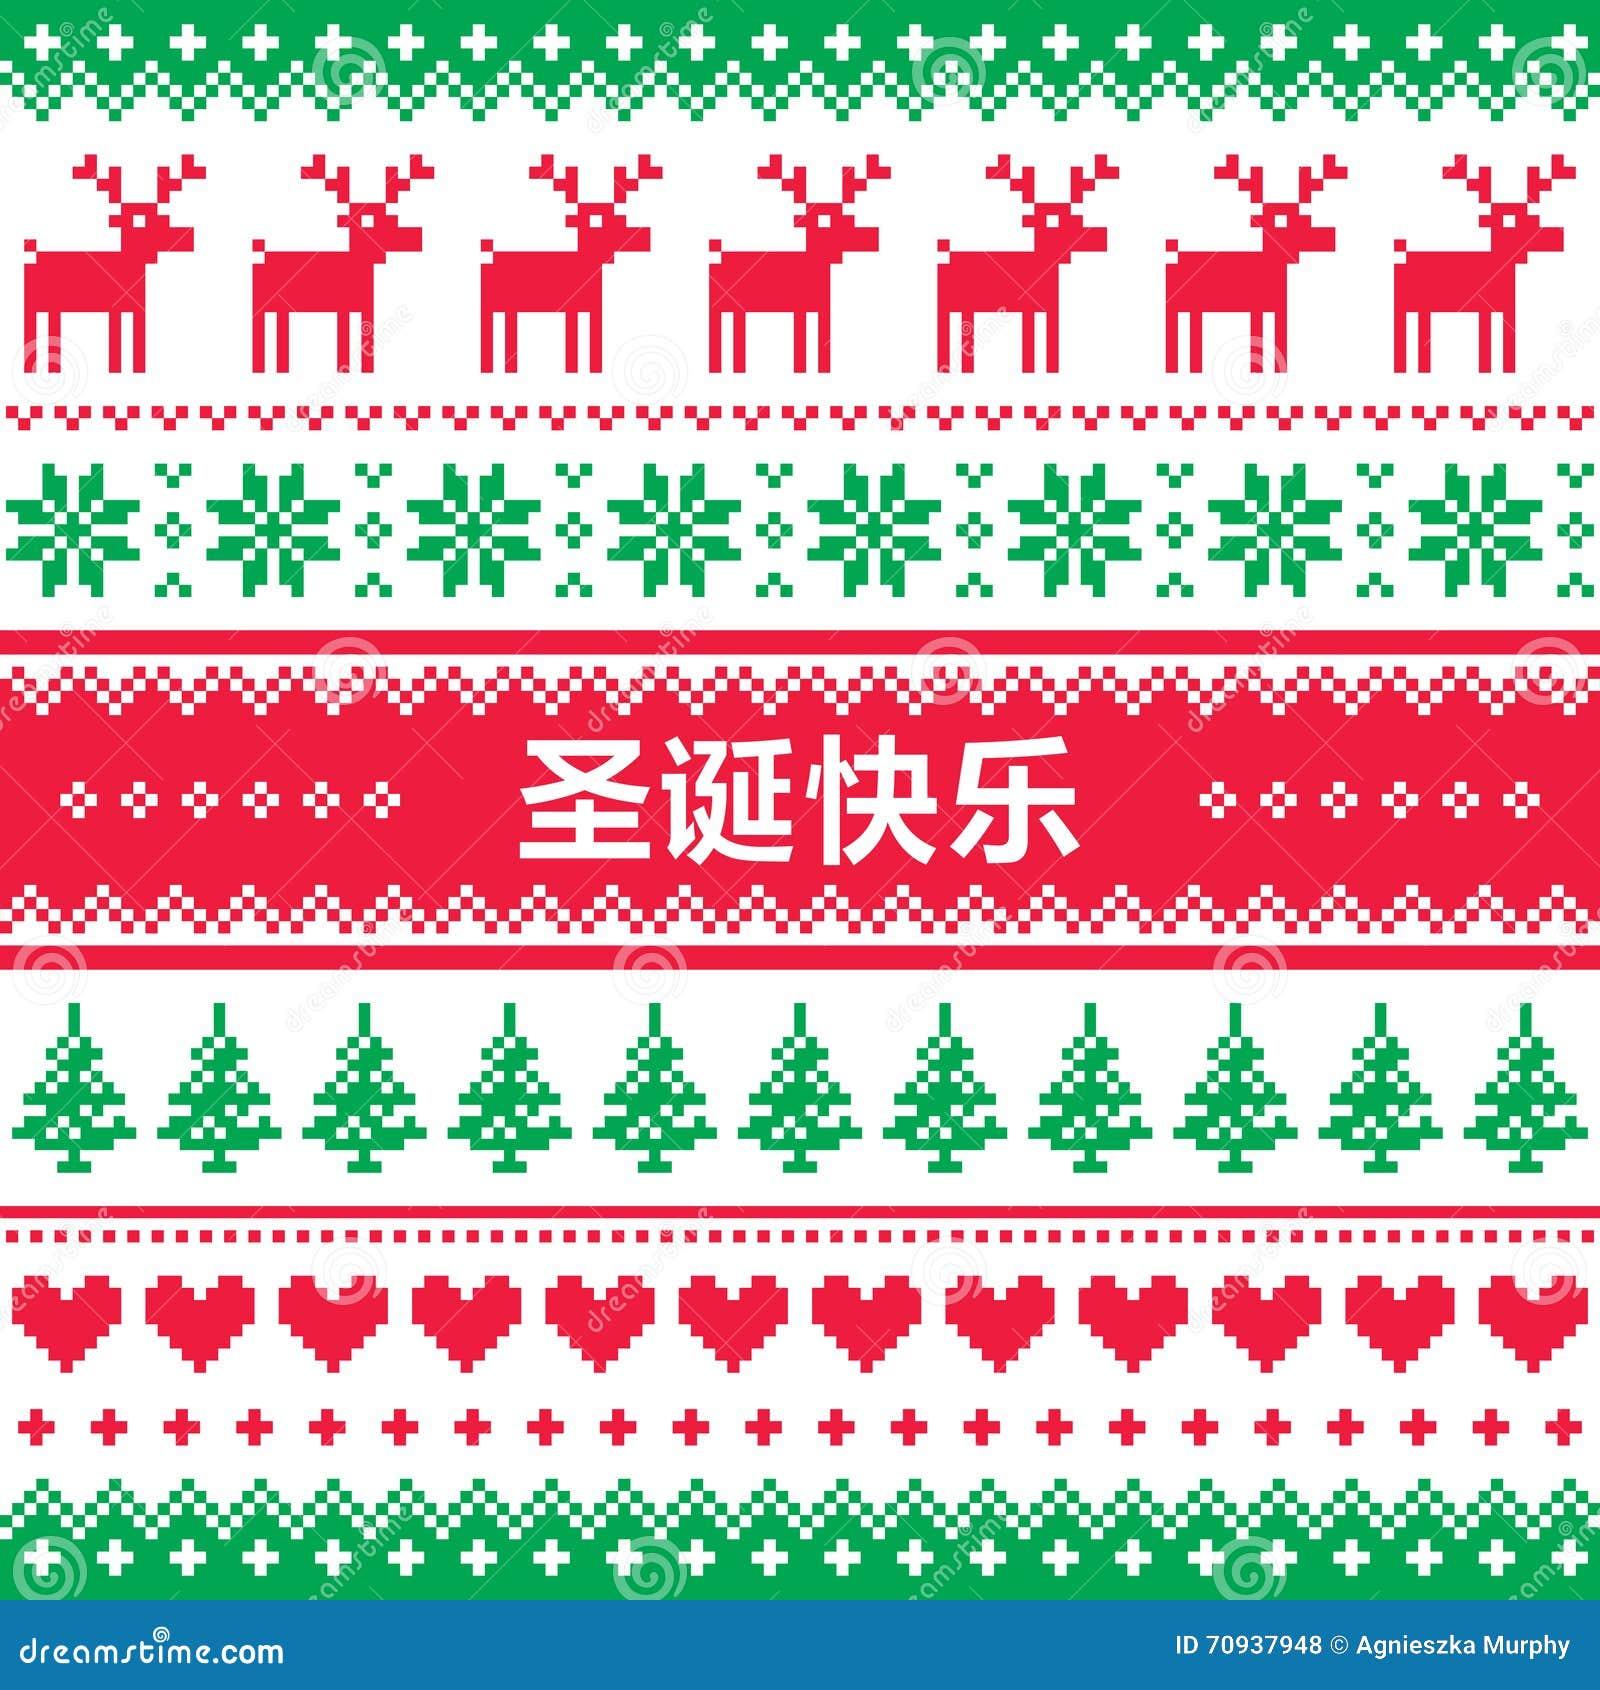 Merry Christmas In Chinese Mandarin Pattern, Greetings Card Stock ...